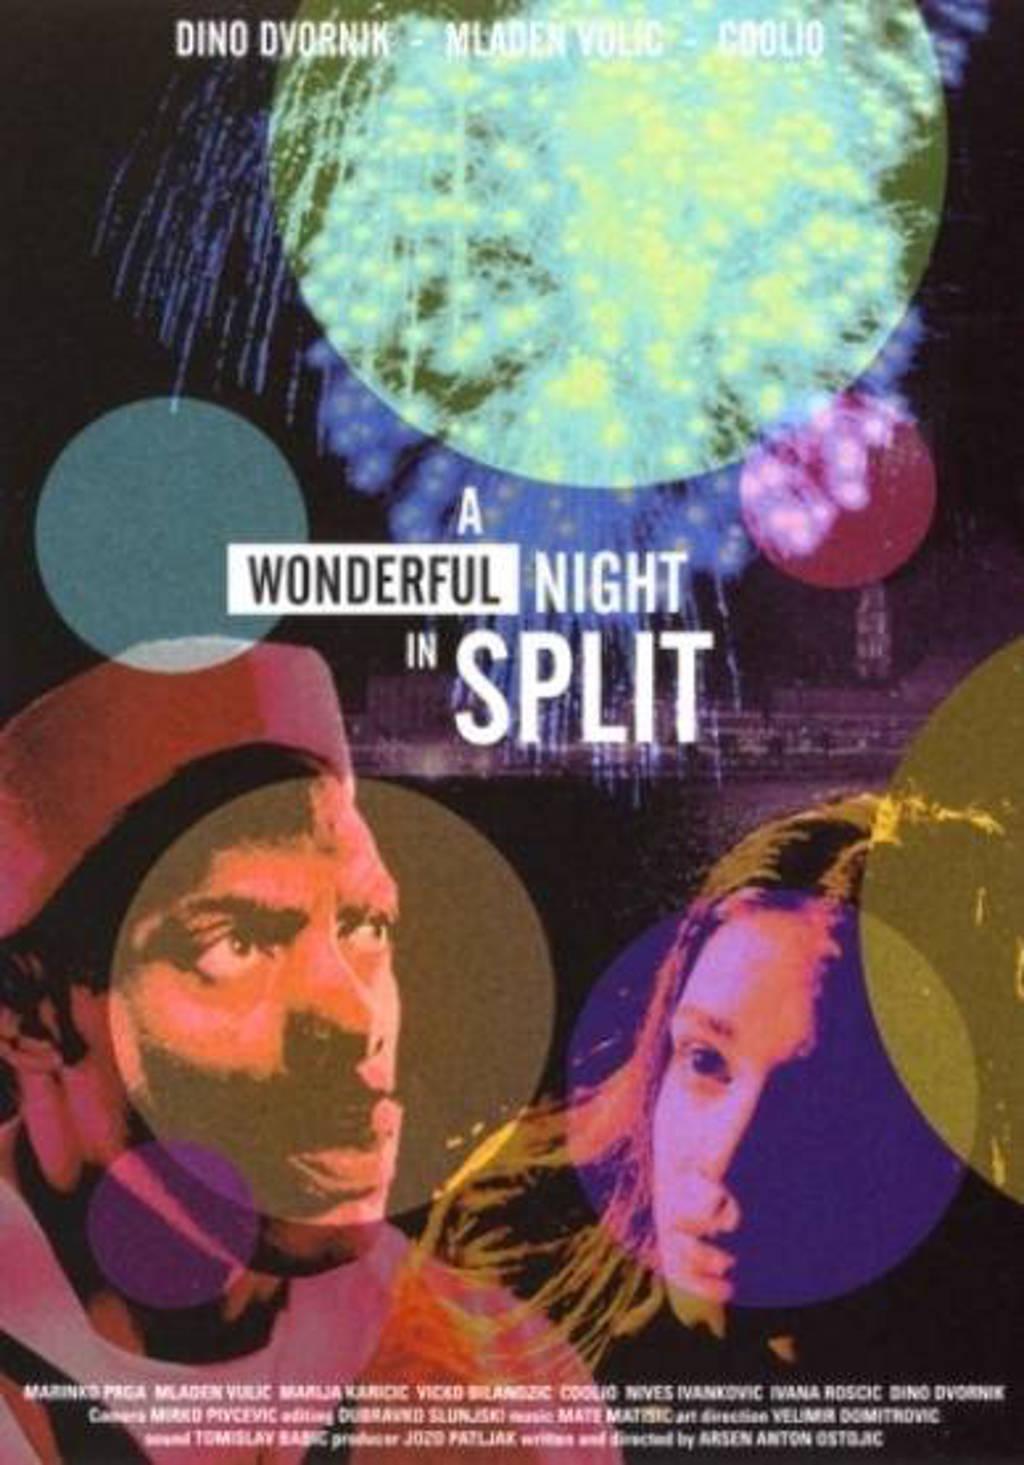 Wonderful night in split (DVD)